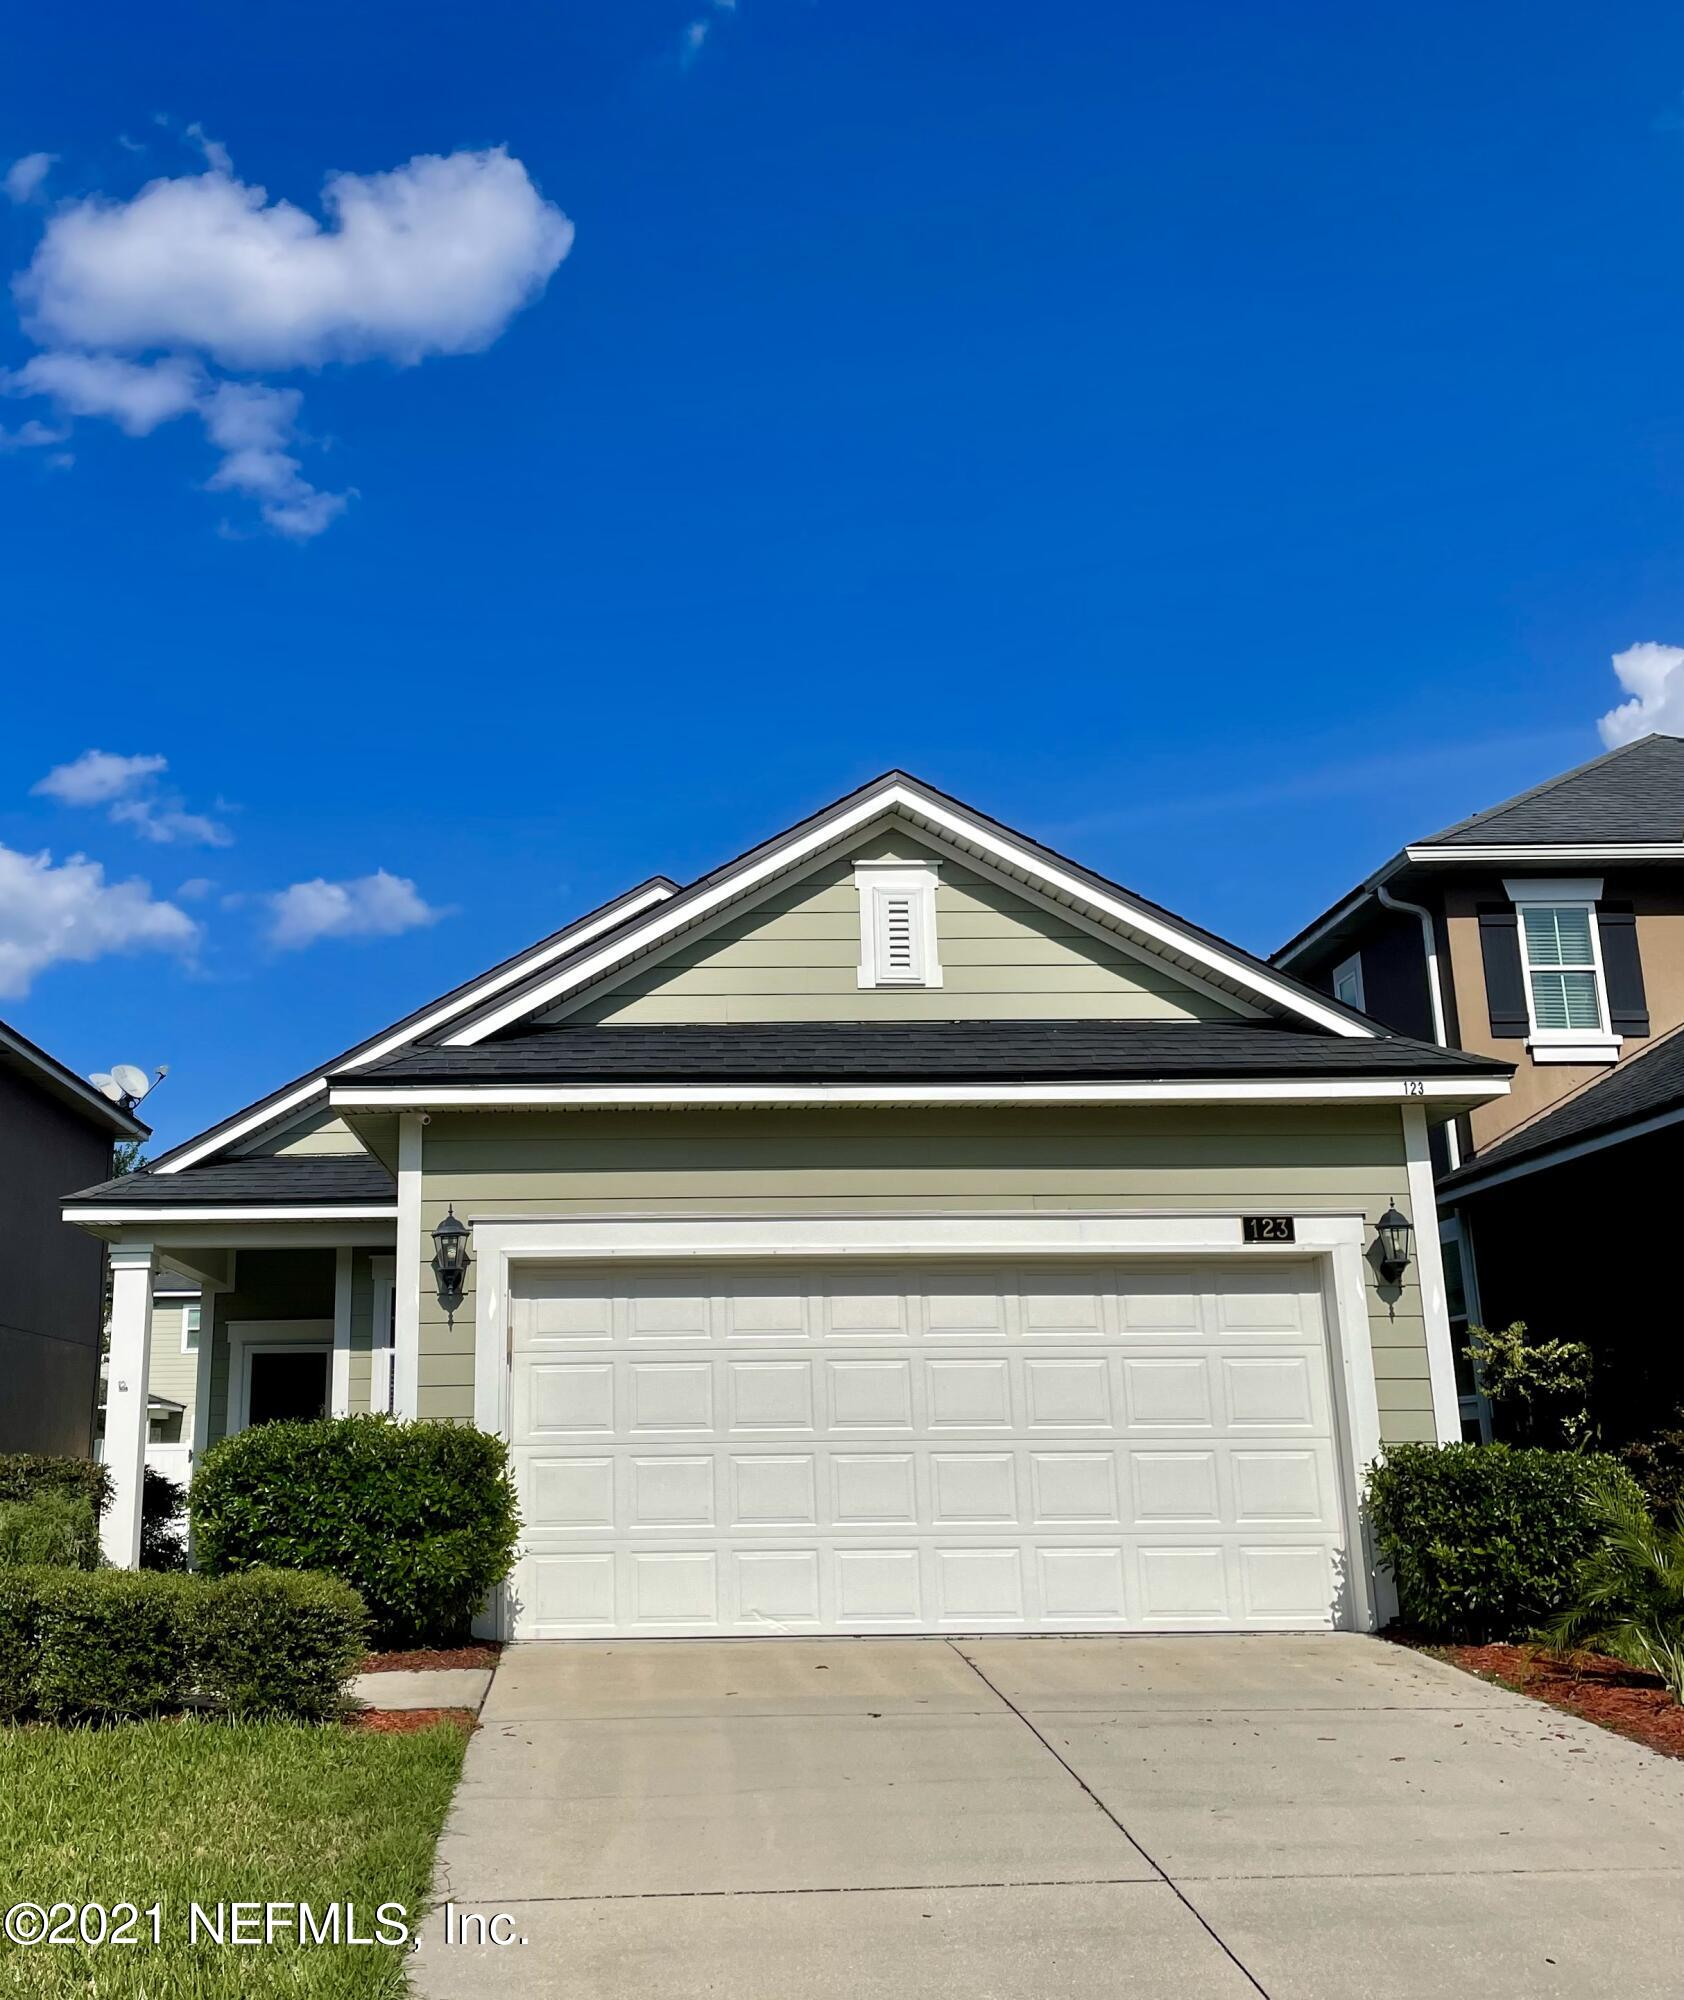 123 WOODLAND GREENS, PONTE VEDRA, FLORIDA 32081, 4 Bedrooms Bedrooms, ,2 BathroomsBathrooms,Rental,For Rent,WOODLAND GREENS,1123826